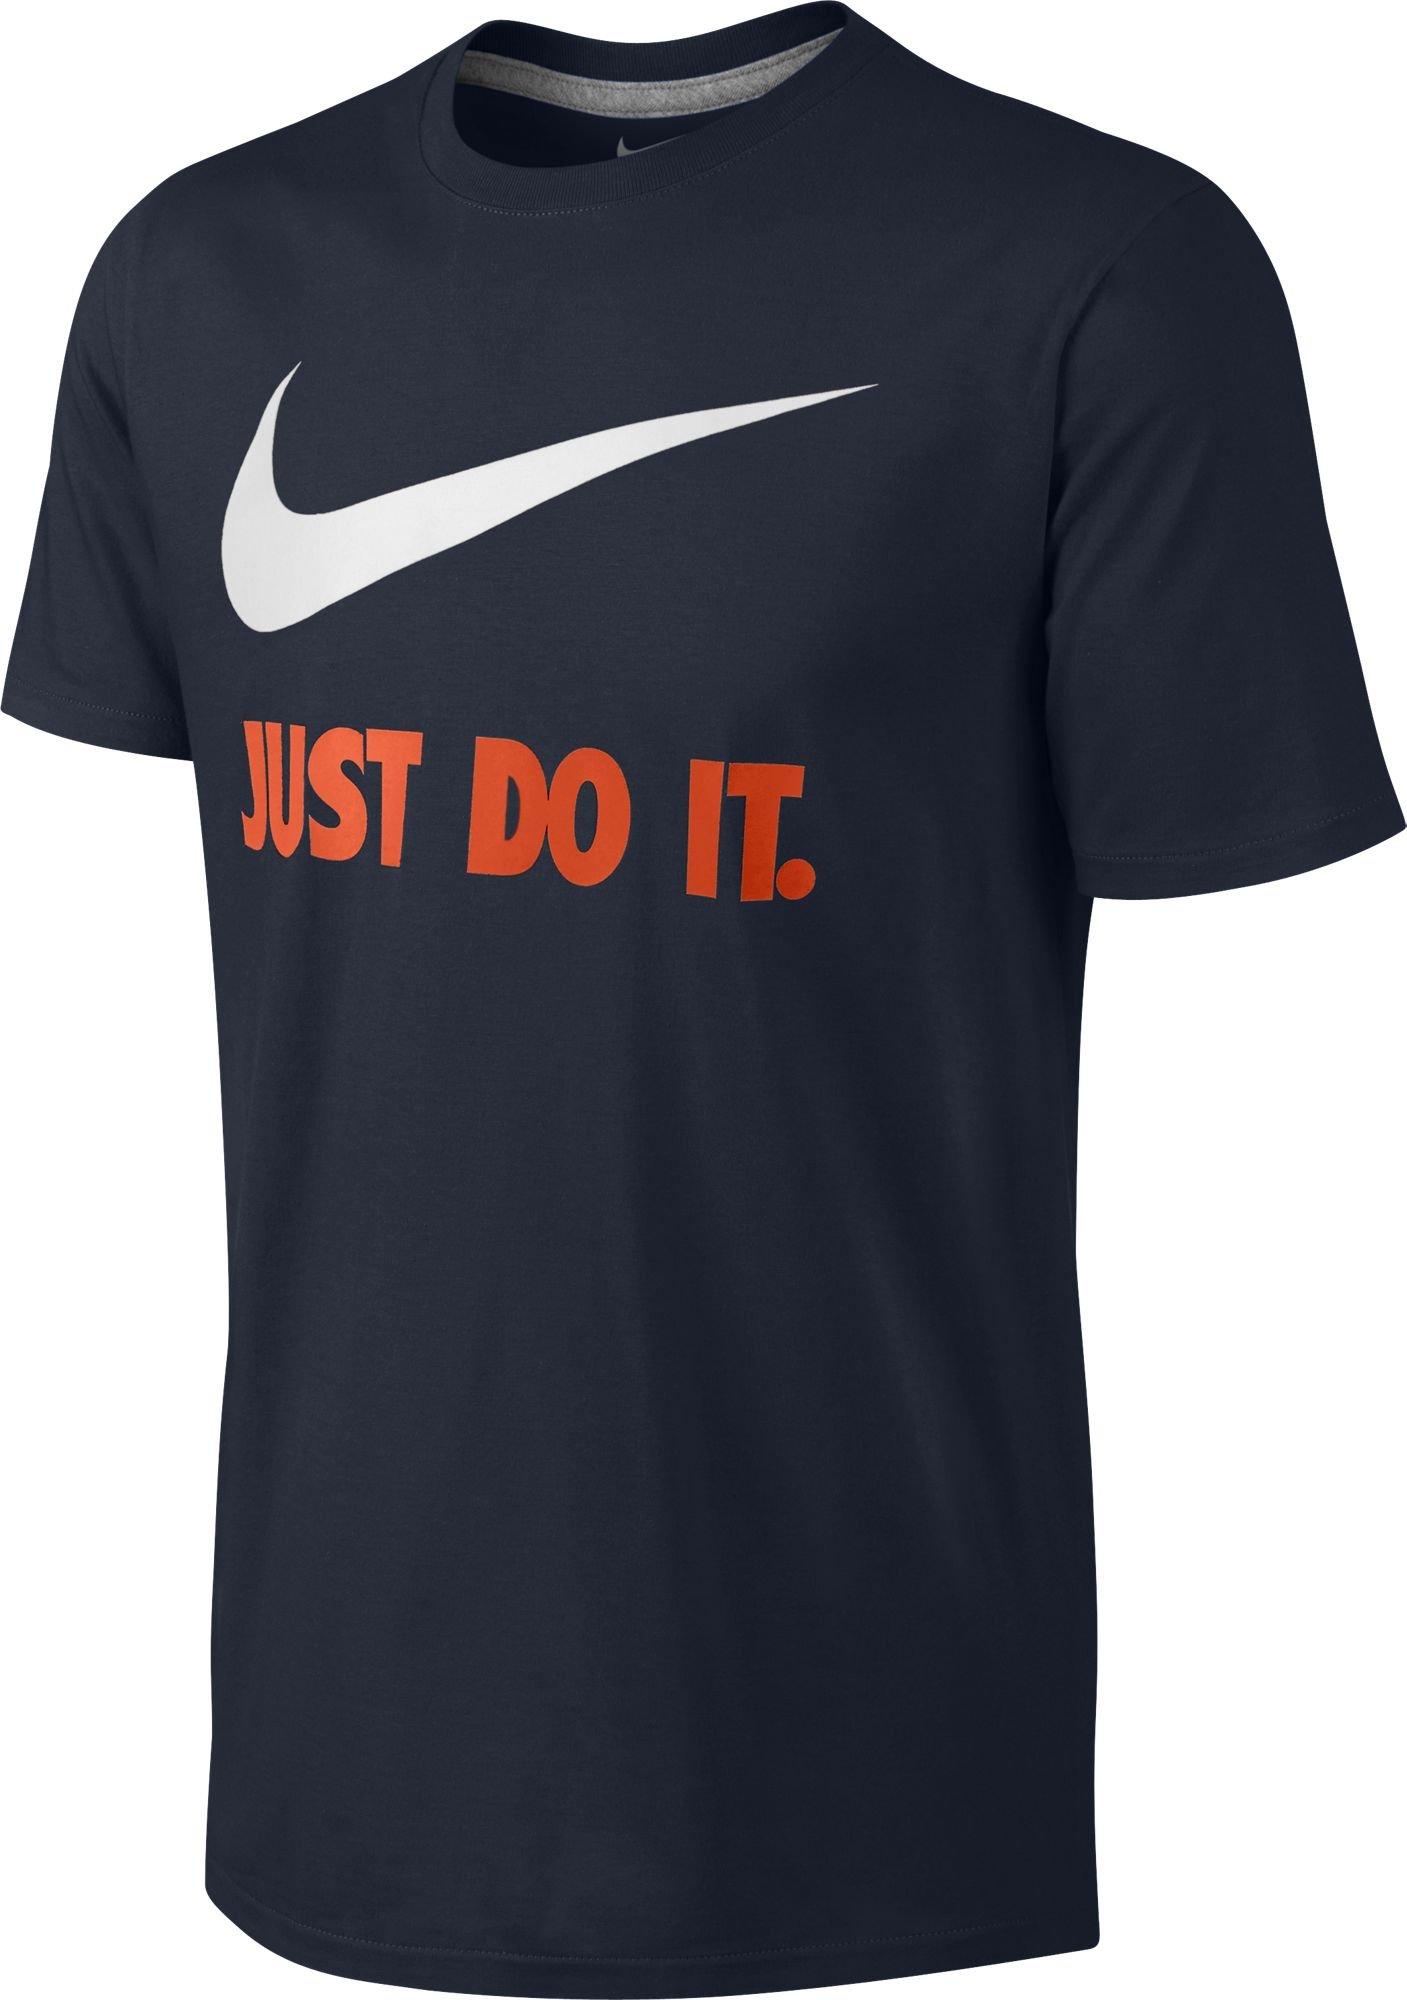 NIKE Mens Swoosh T-Shirt, S, Blue